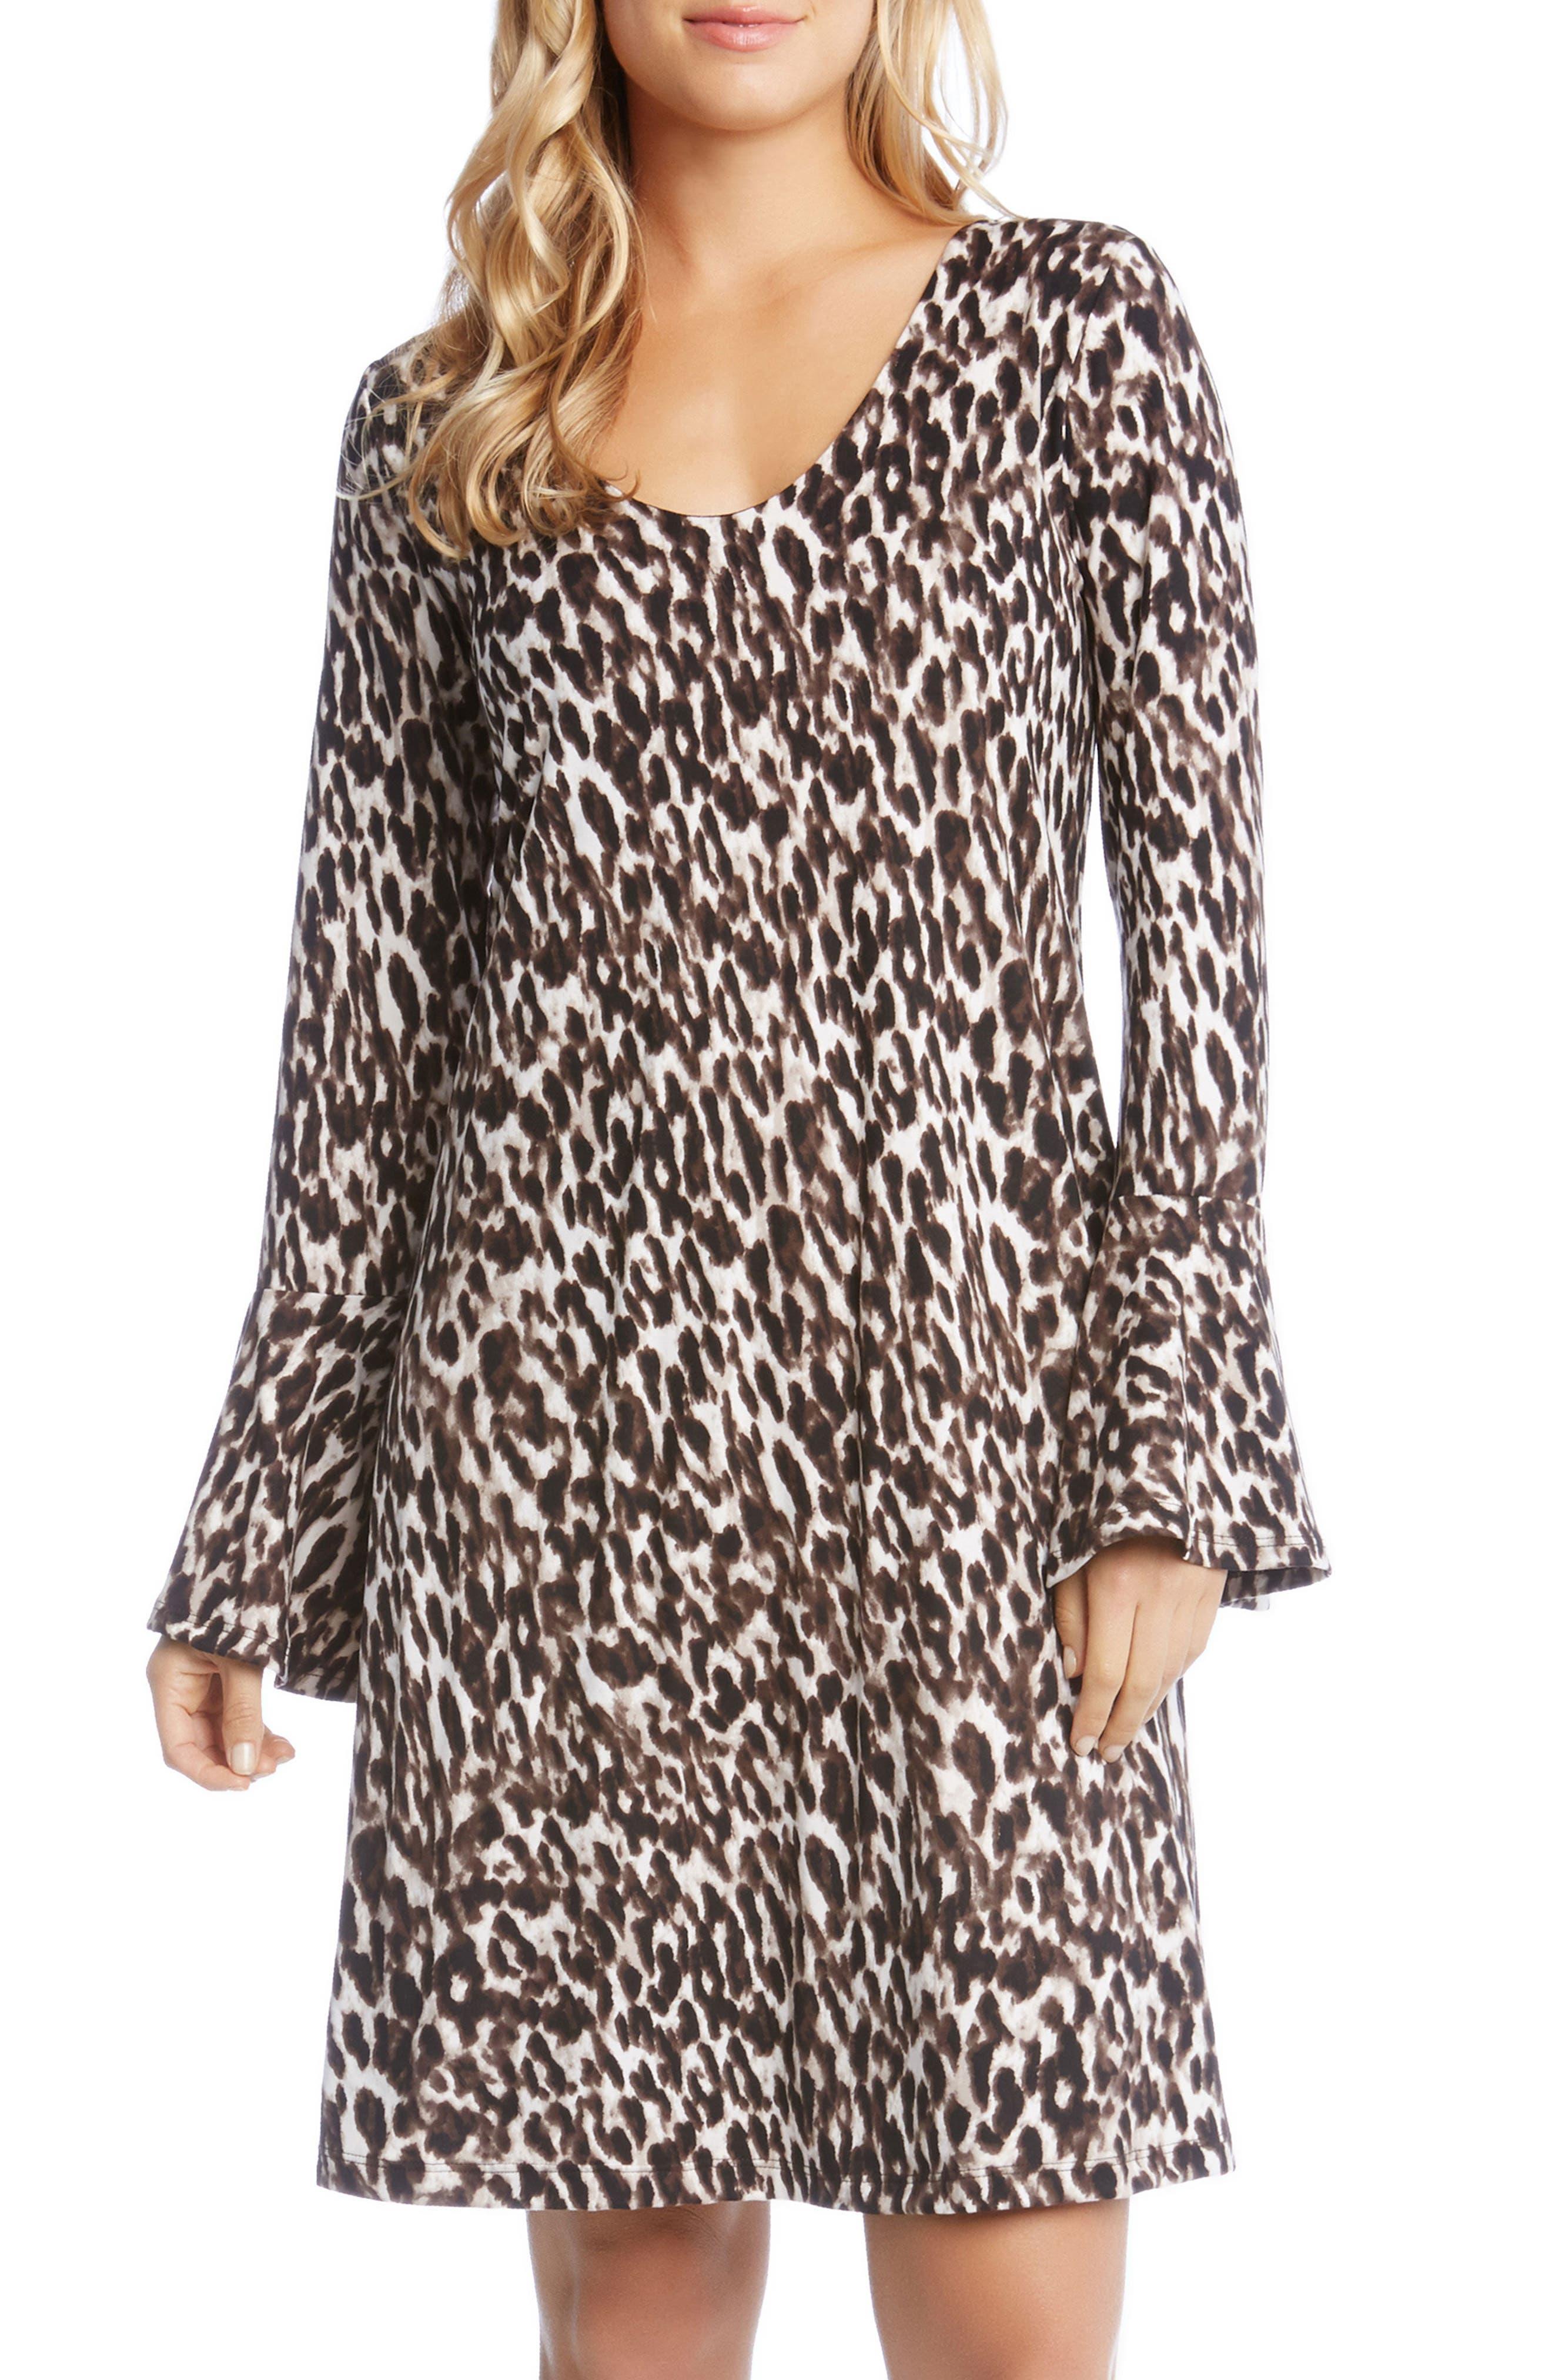 Bell Sleeve Brushed Knit Dress,                         Main,                         color, Leopard